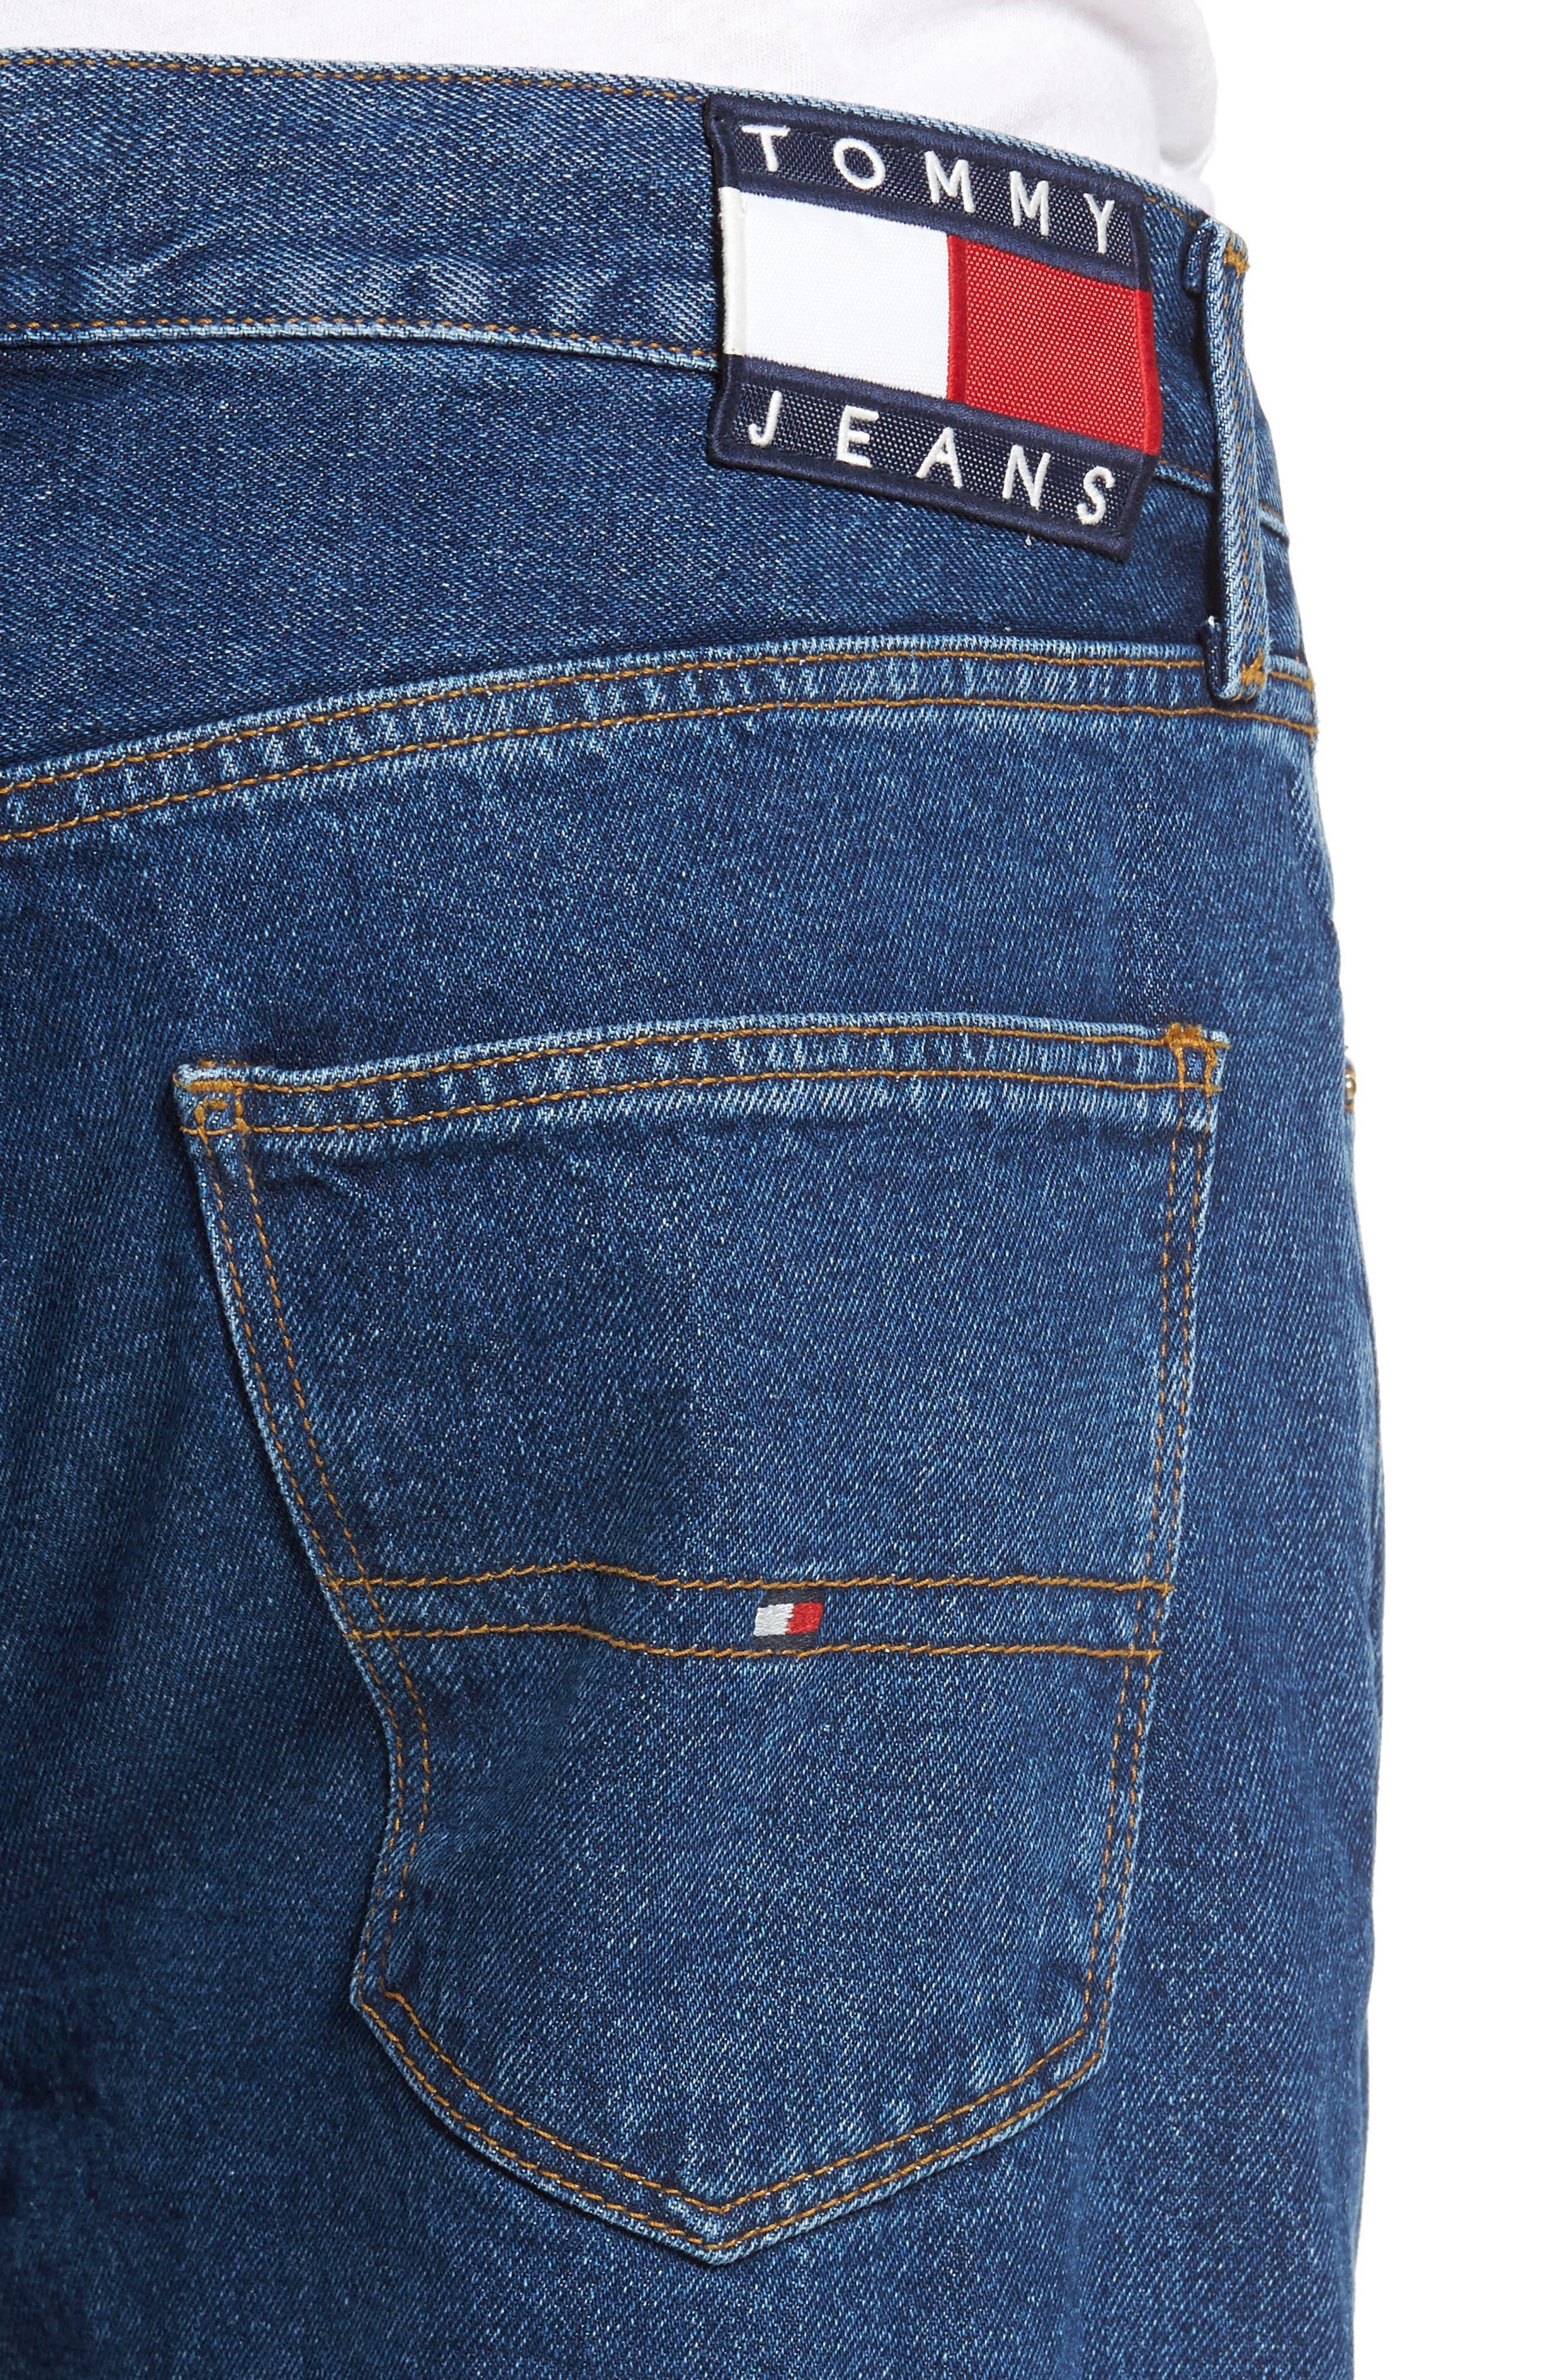 90s Classic Straight Leg Jeans,                             Alternate thumbnail 4, color,                             Denim Blue